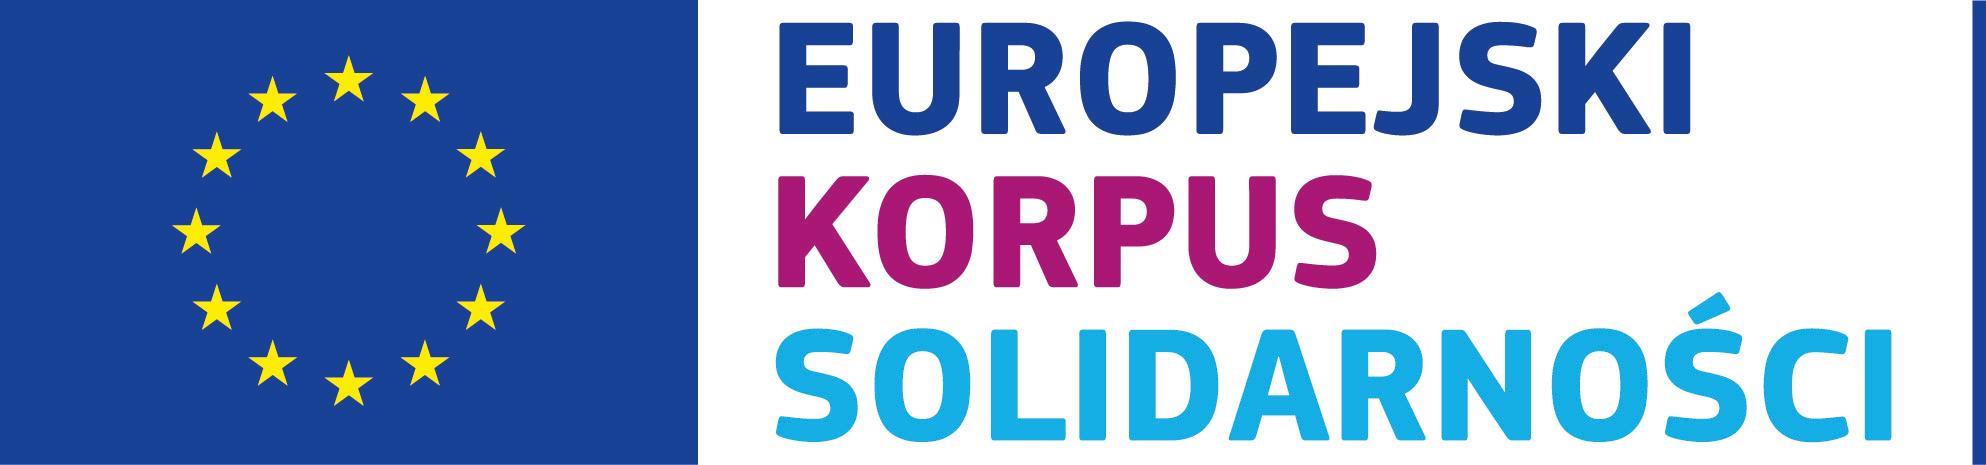 logo Europejski Korpus Solidarności